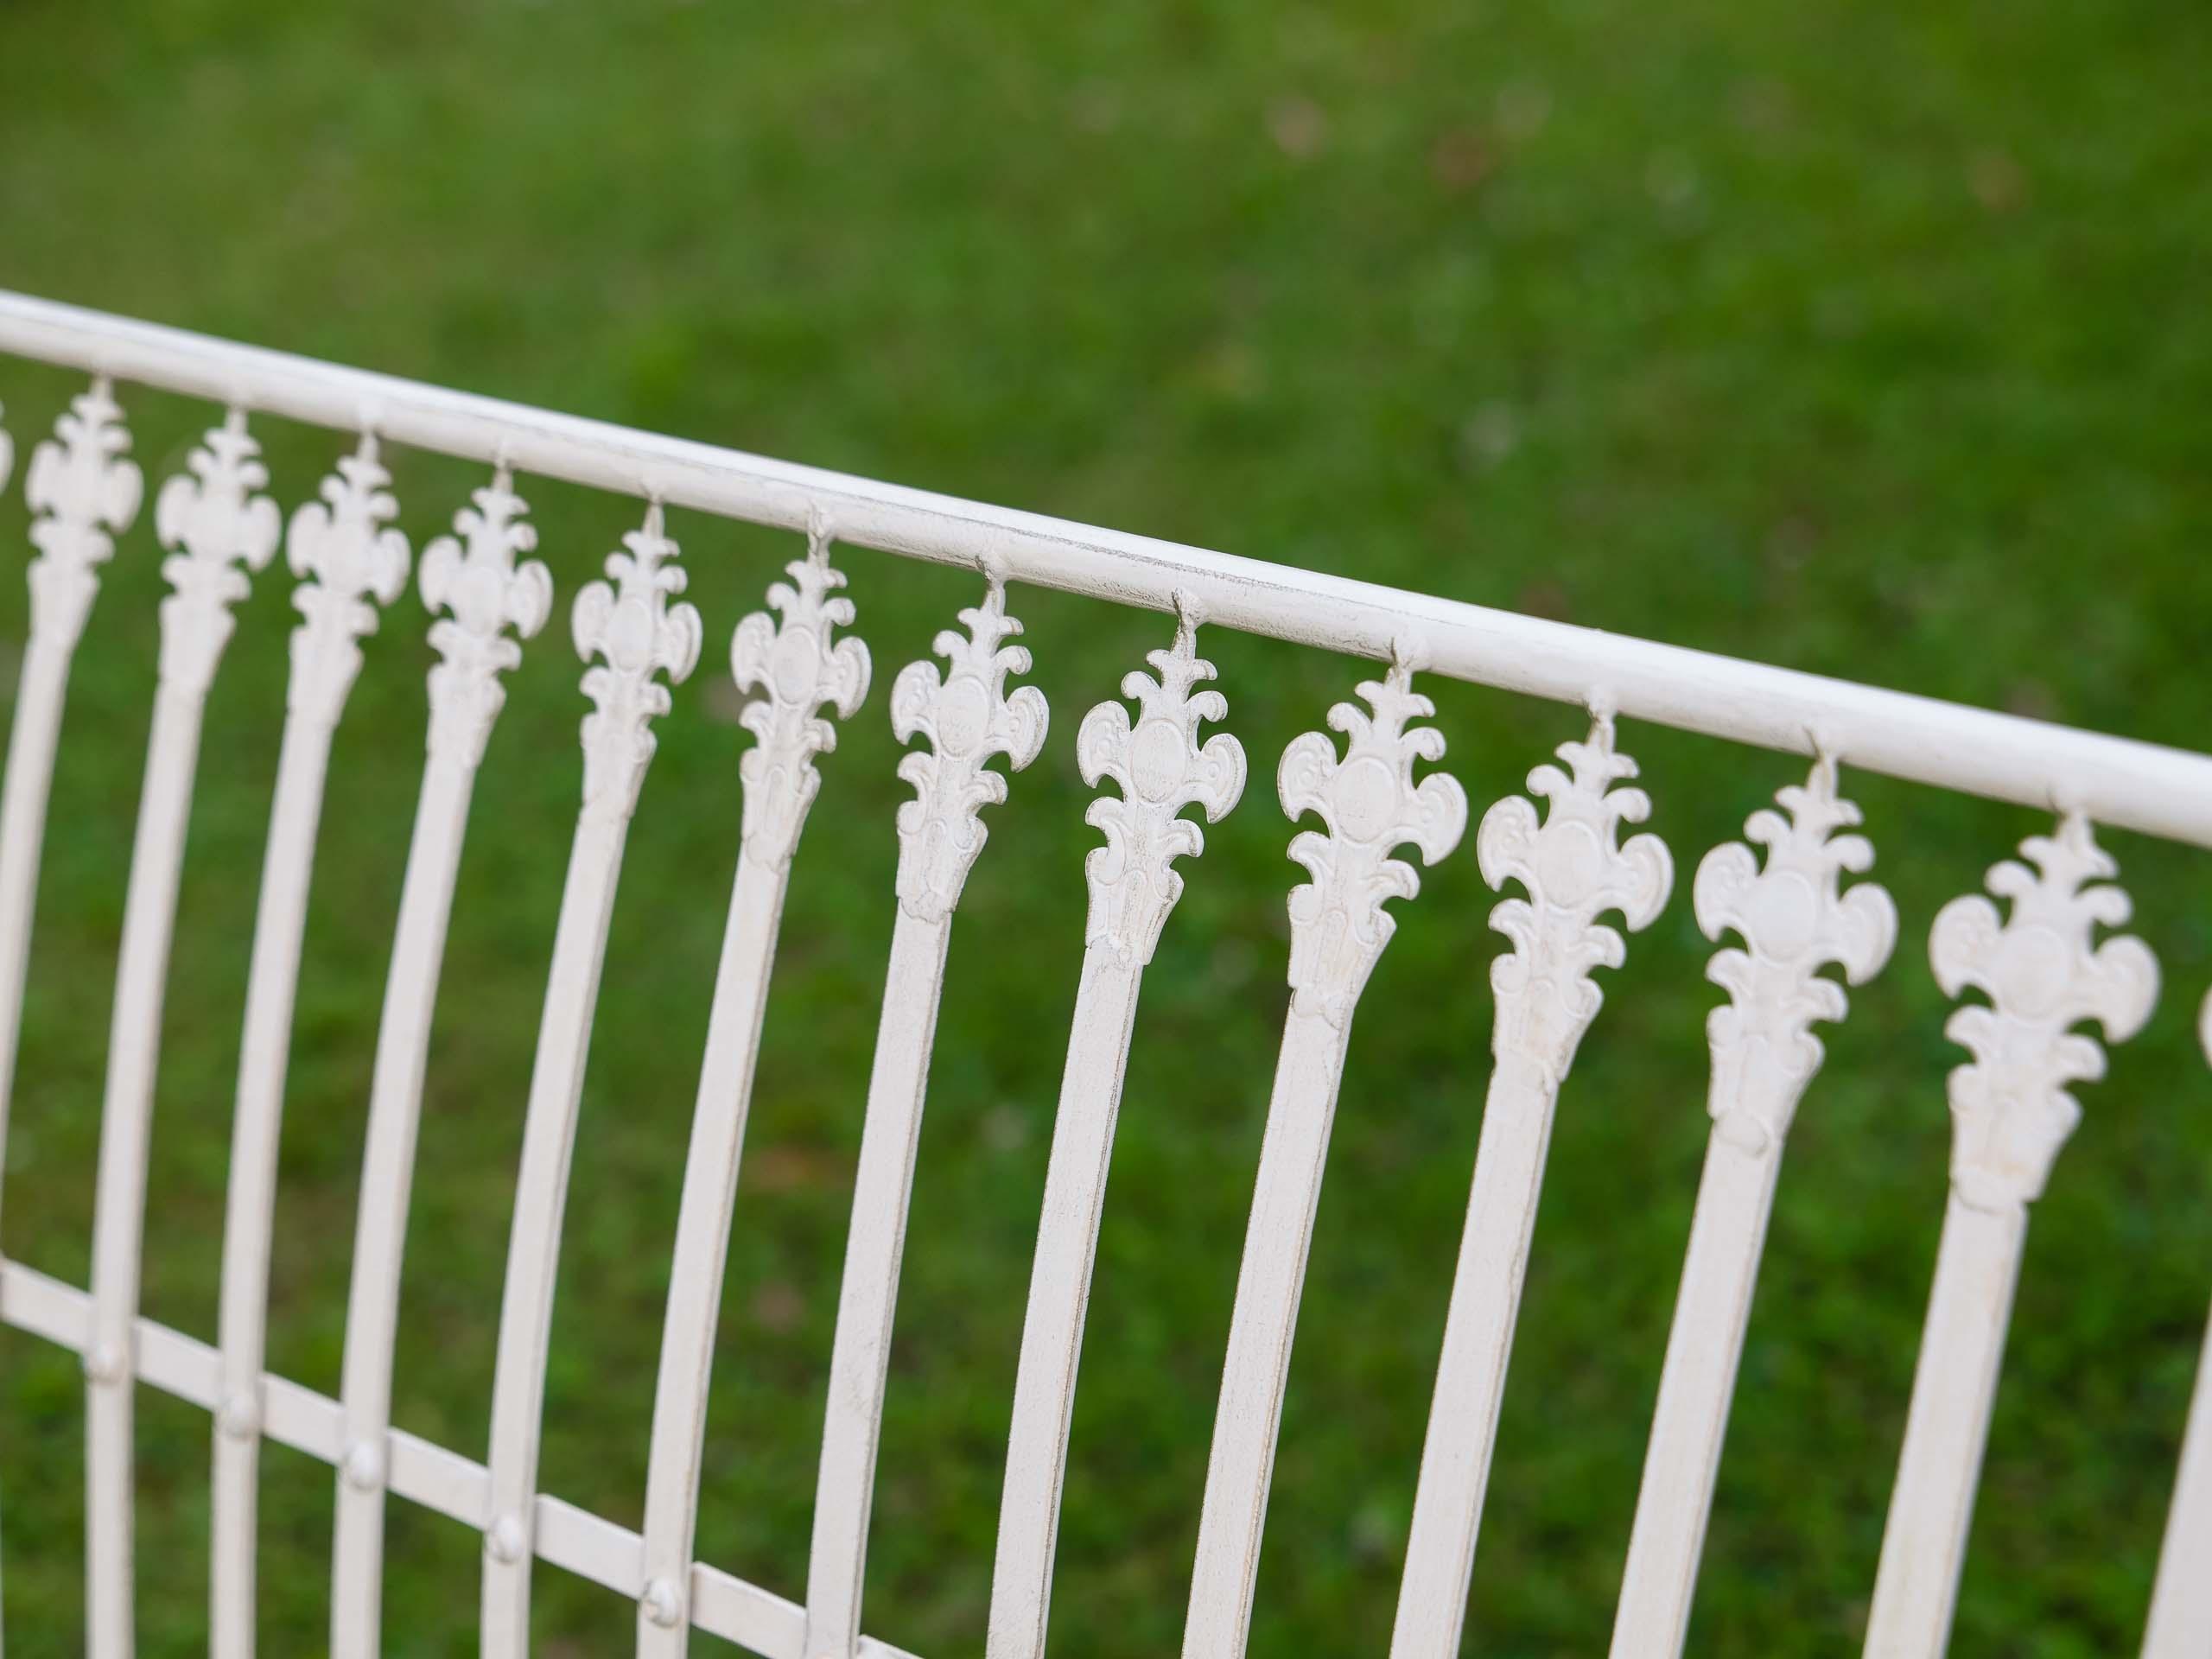 Nostalgie Gartenbank Lilie fleur de lis Eisen Antik-Stil creme weiss iron garden